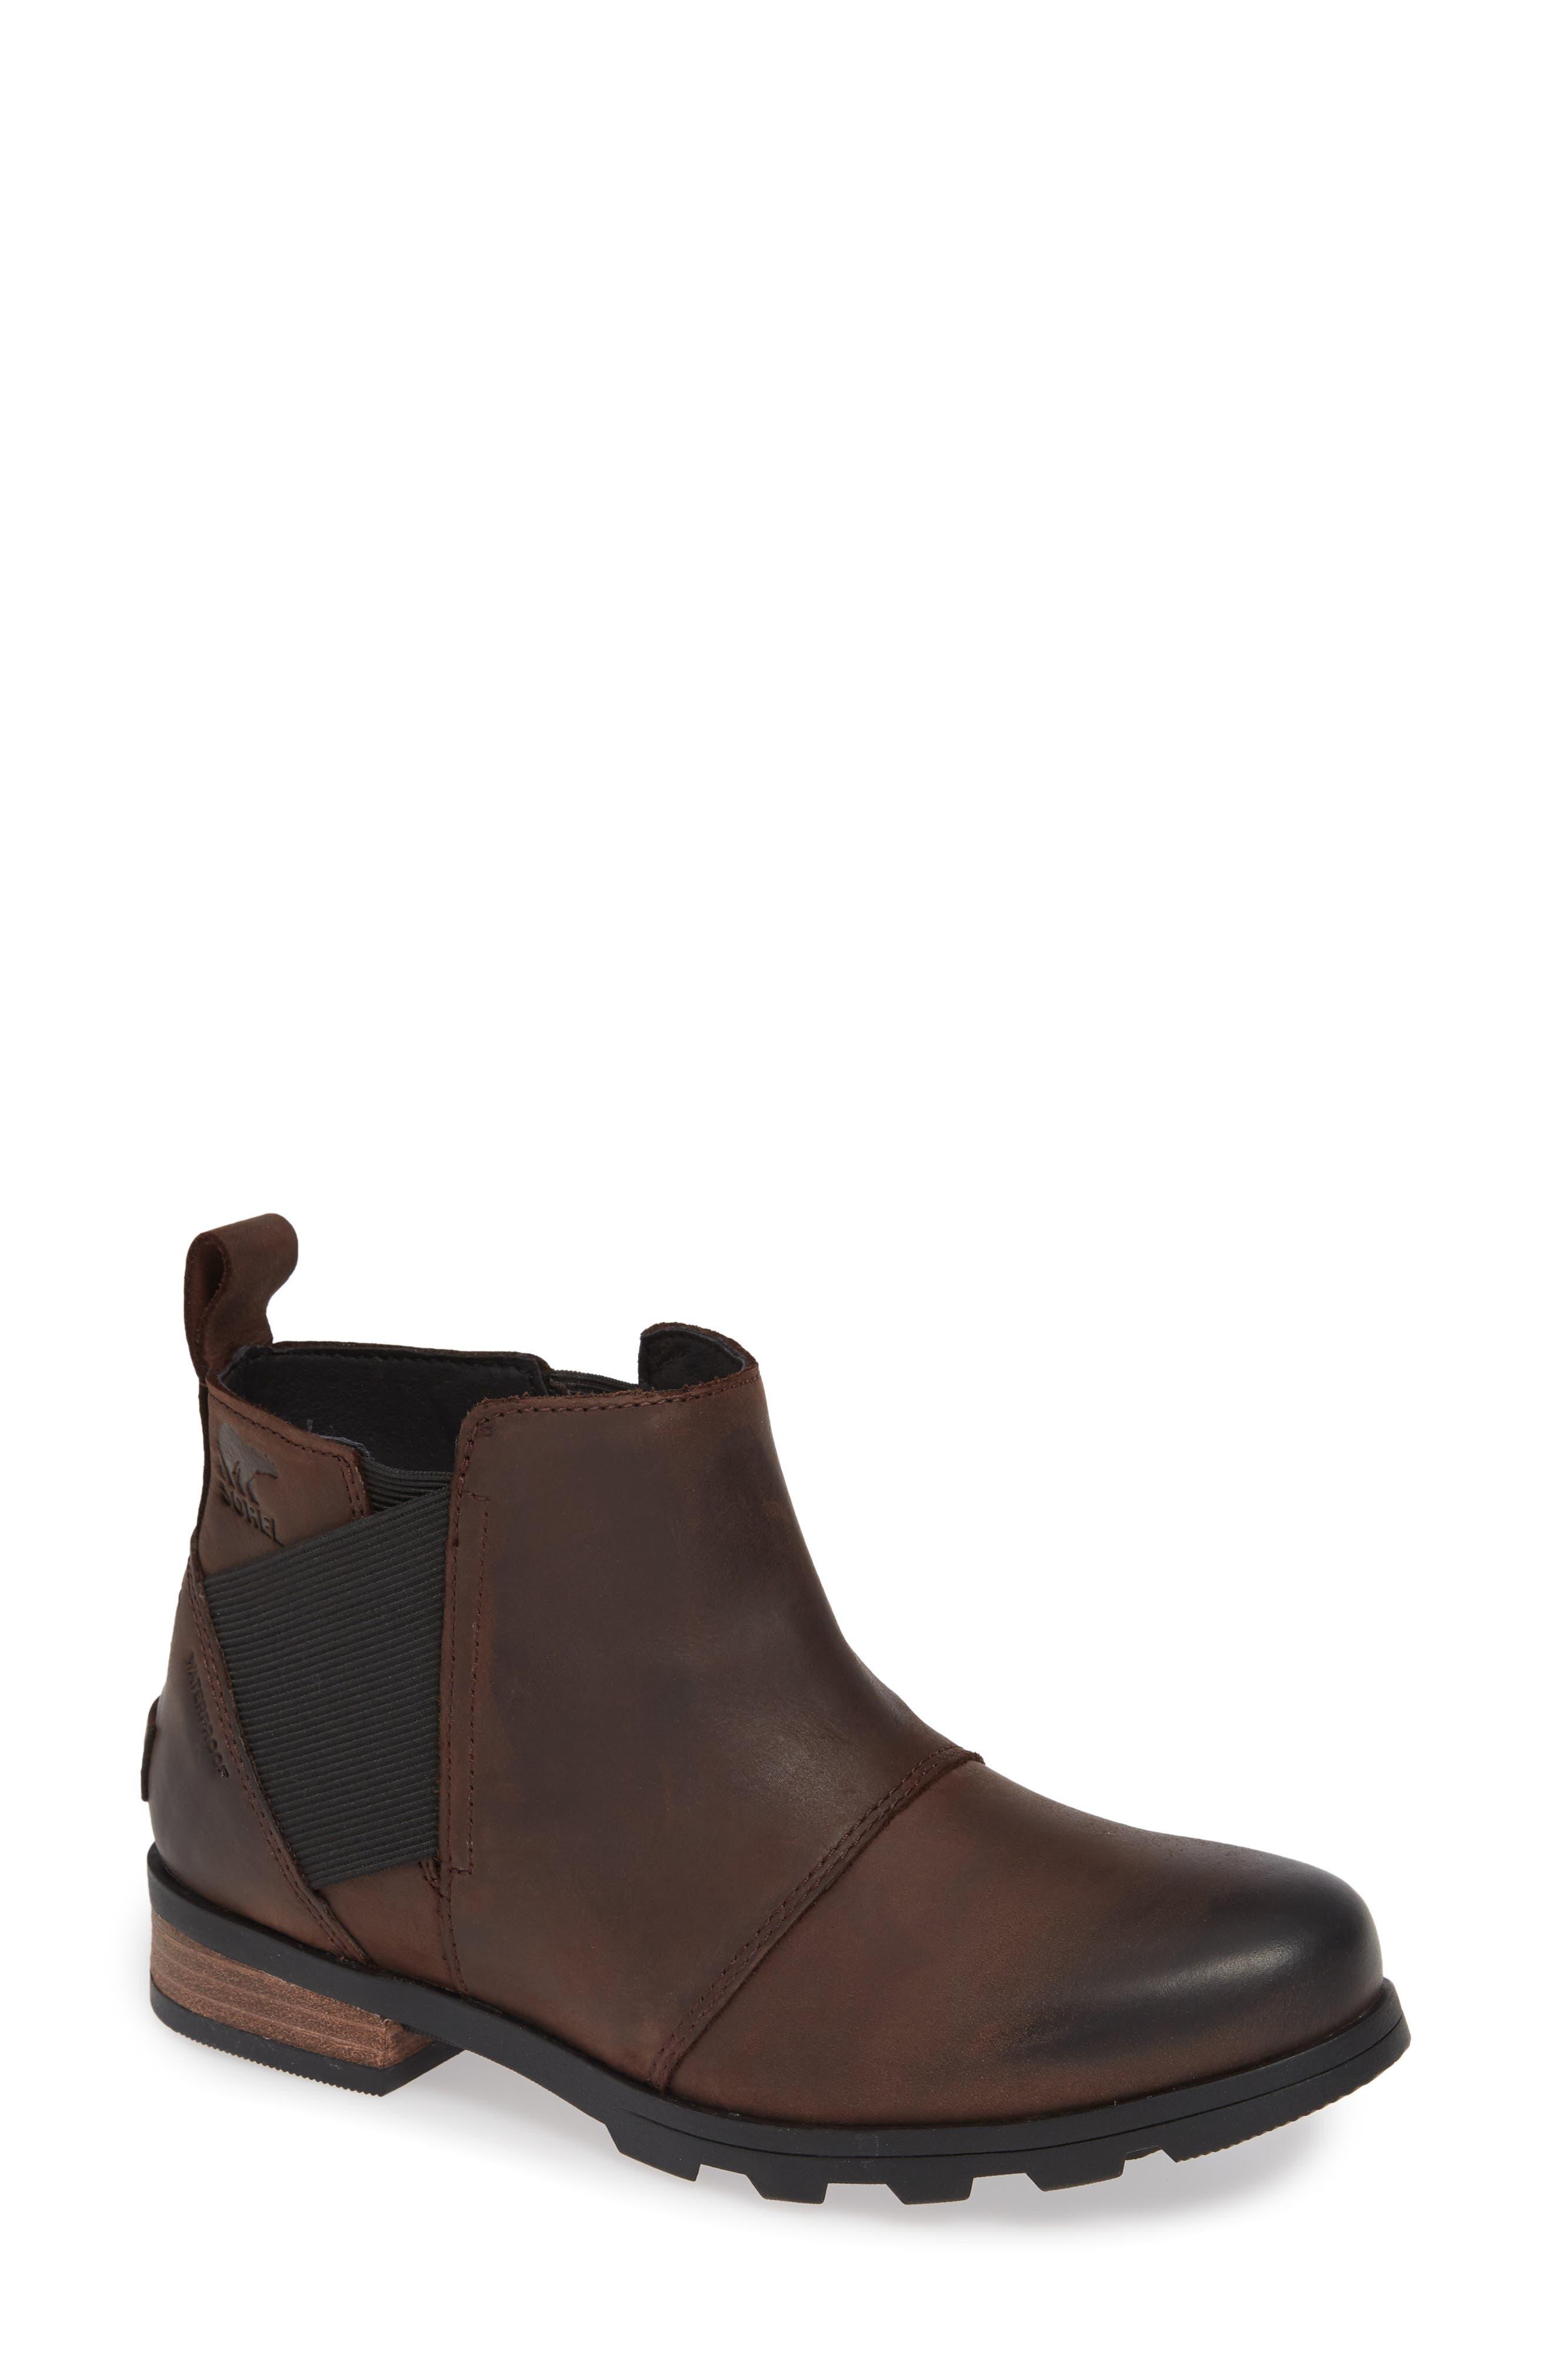 Emelie Waterproof Chelsea Boot,                         Main,                         color, CATTAIL